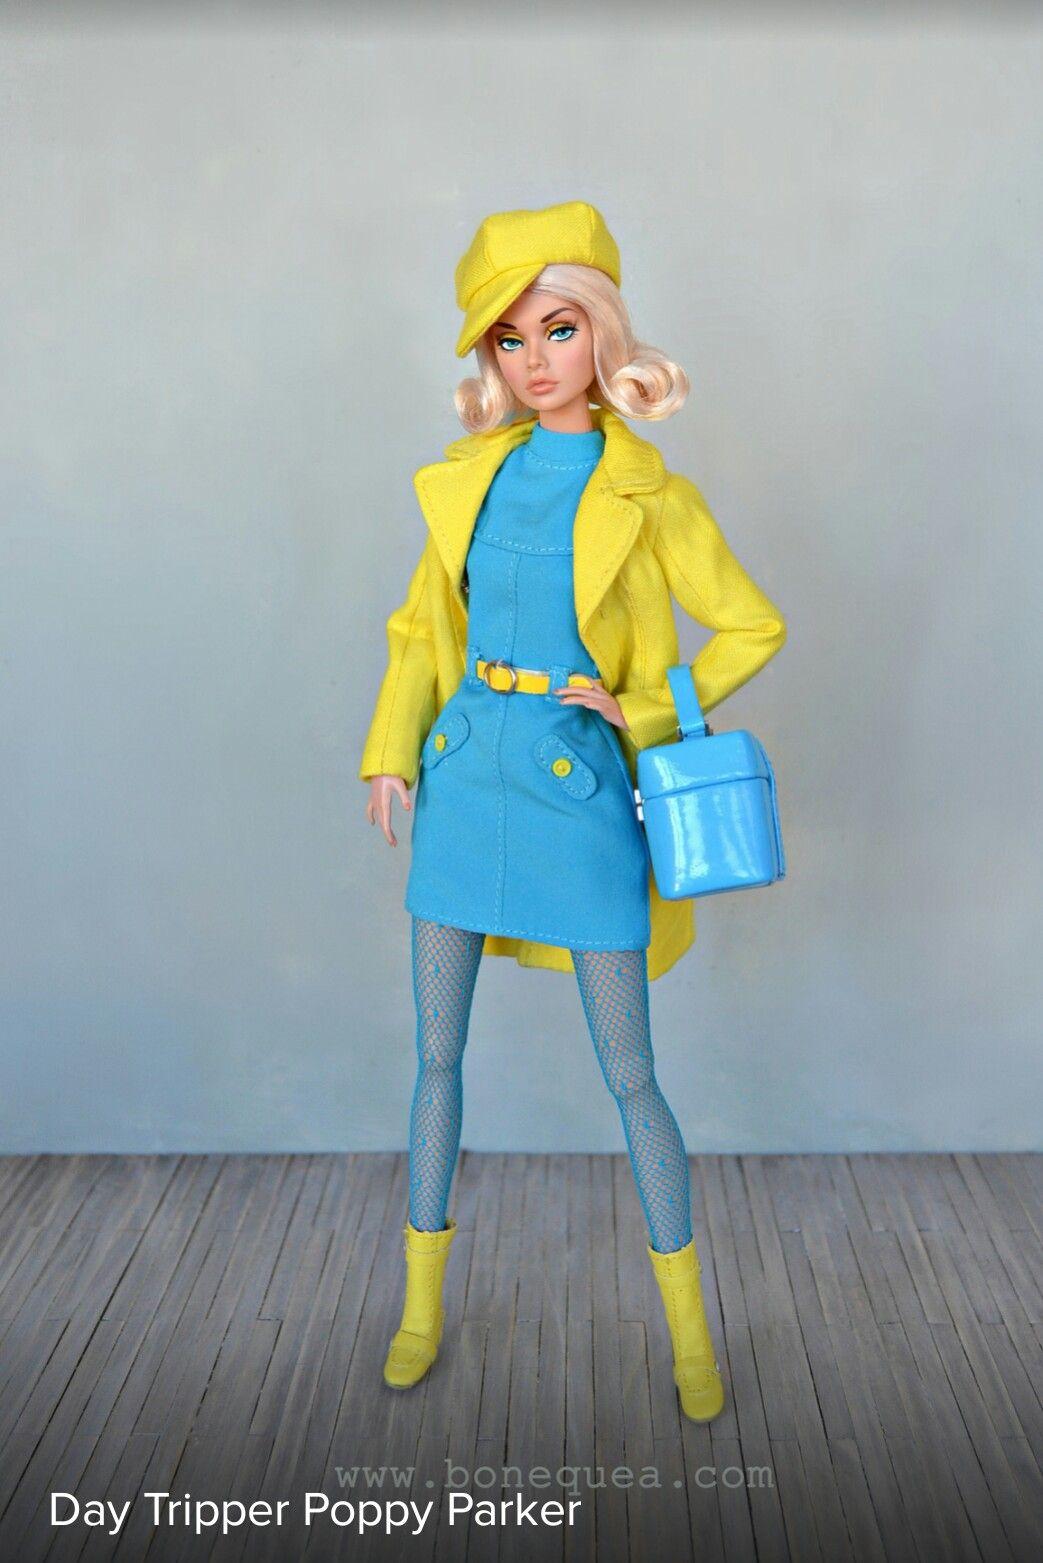 Pin de Eulalia Arenas en Barbie   Pinterest   Barbie